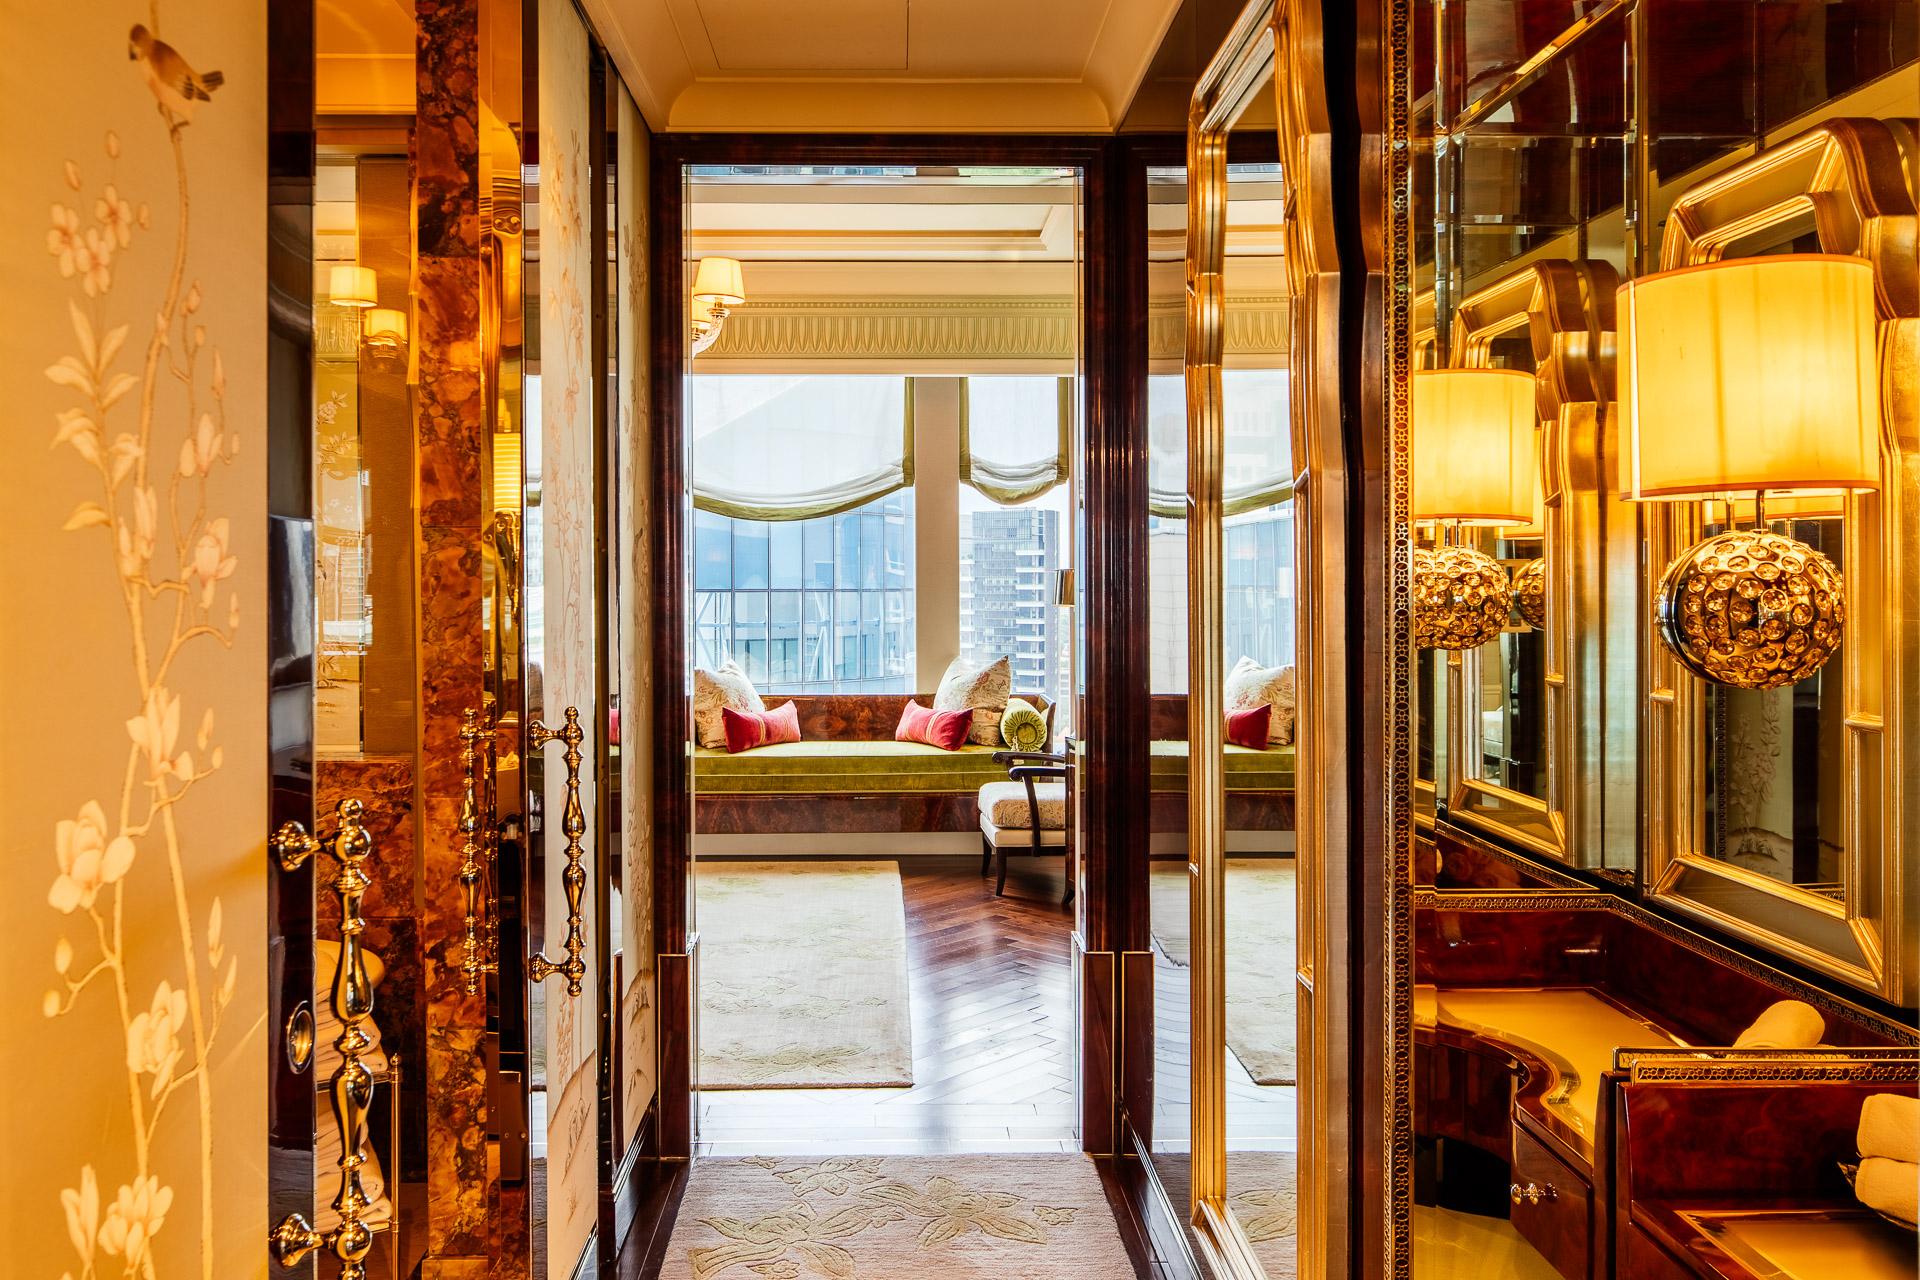 st-regis-singapore-marriott-luxury-hotel-photographer-20.jpg